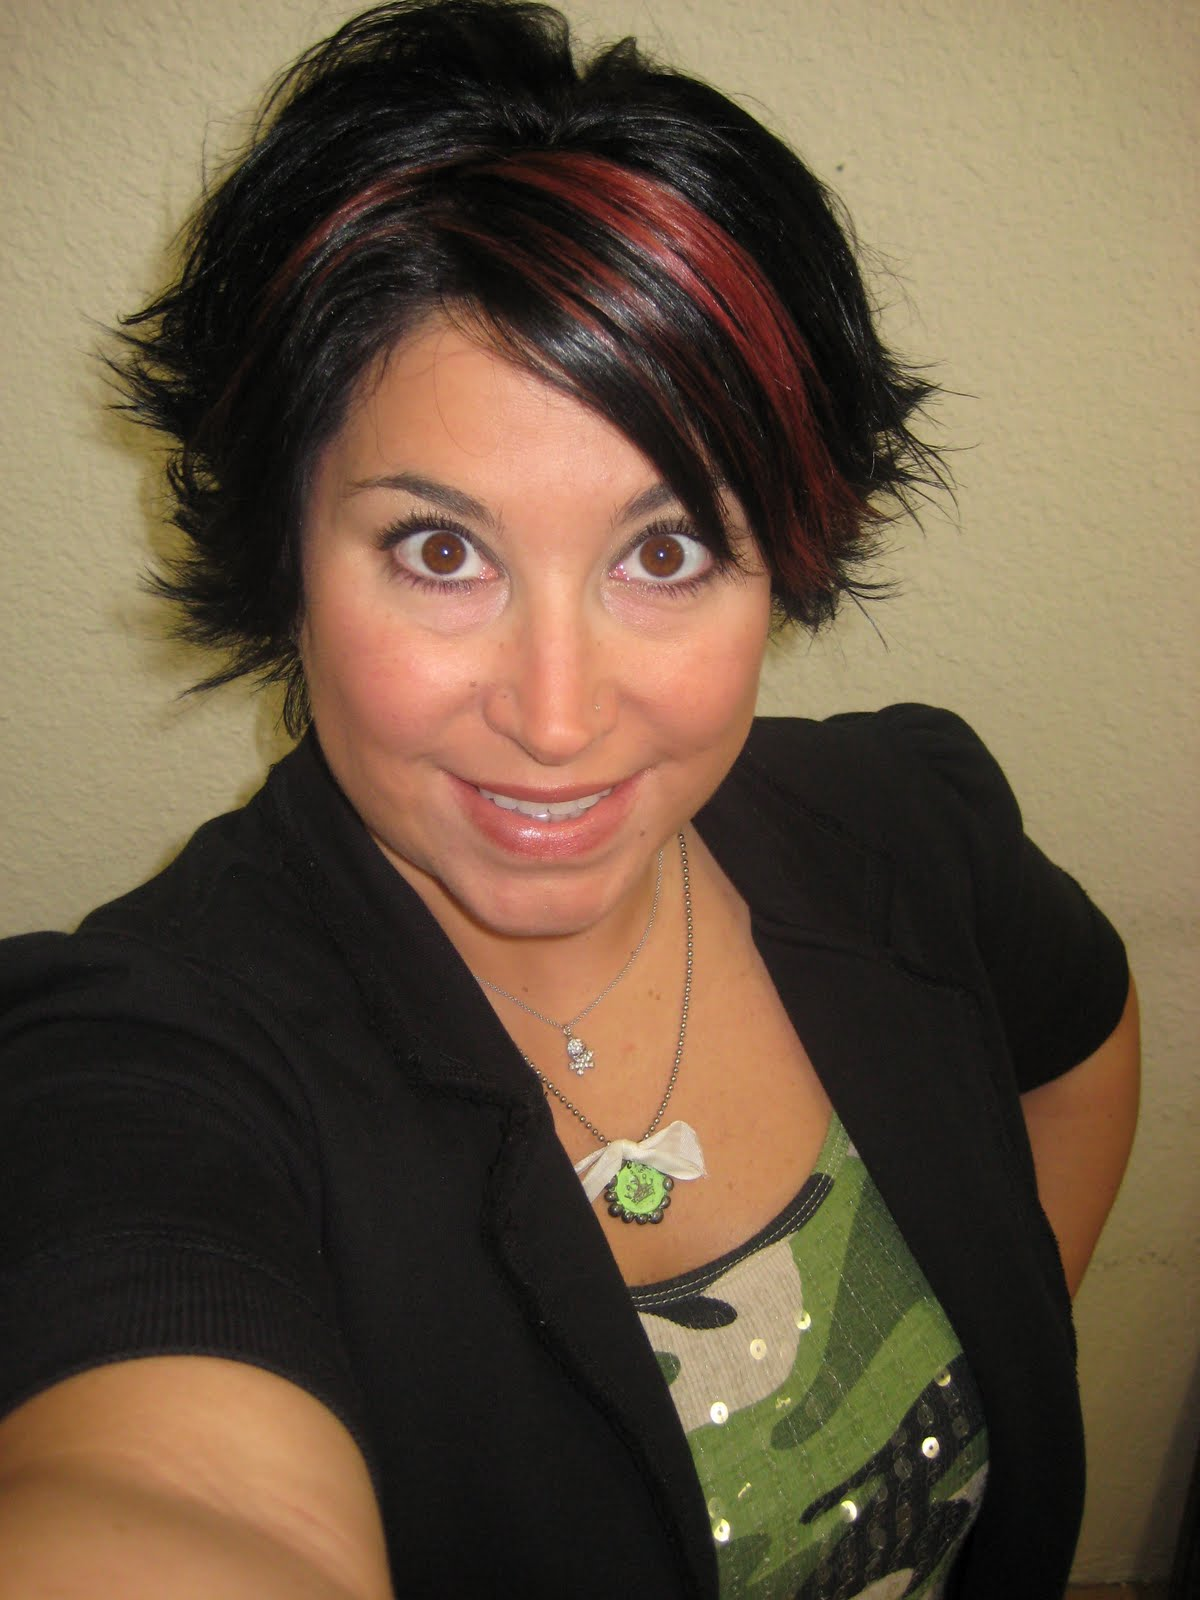 Quality Highlights In Short Dark Brown Hair Smart Ideas The